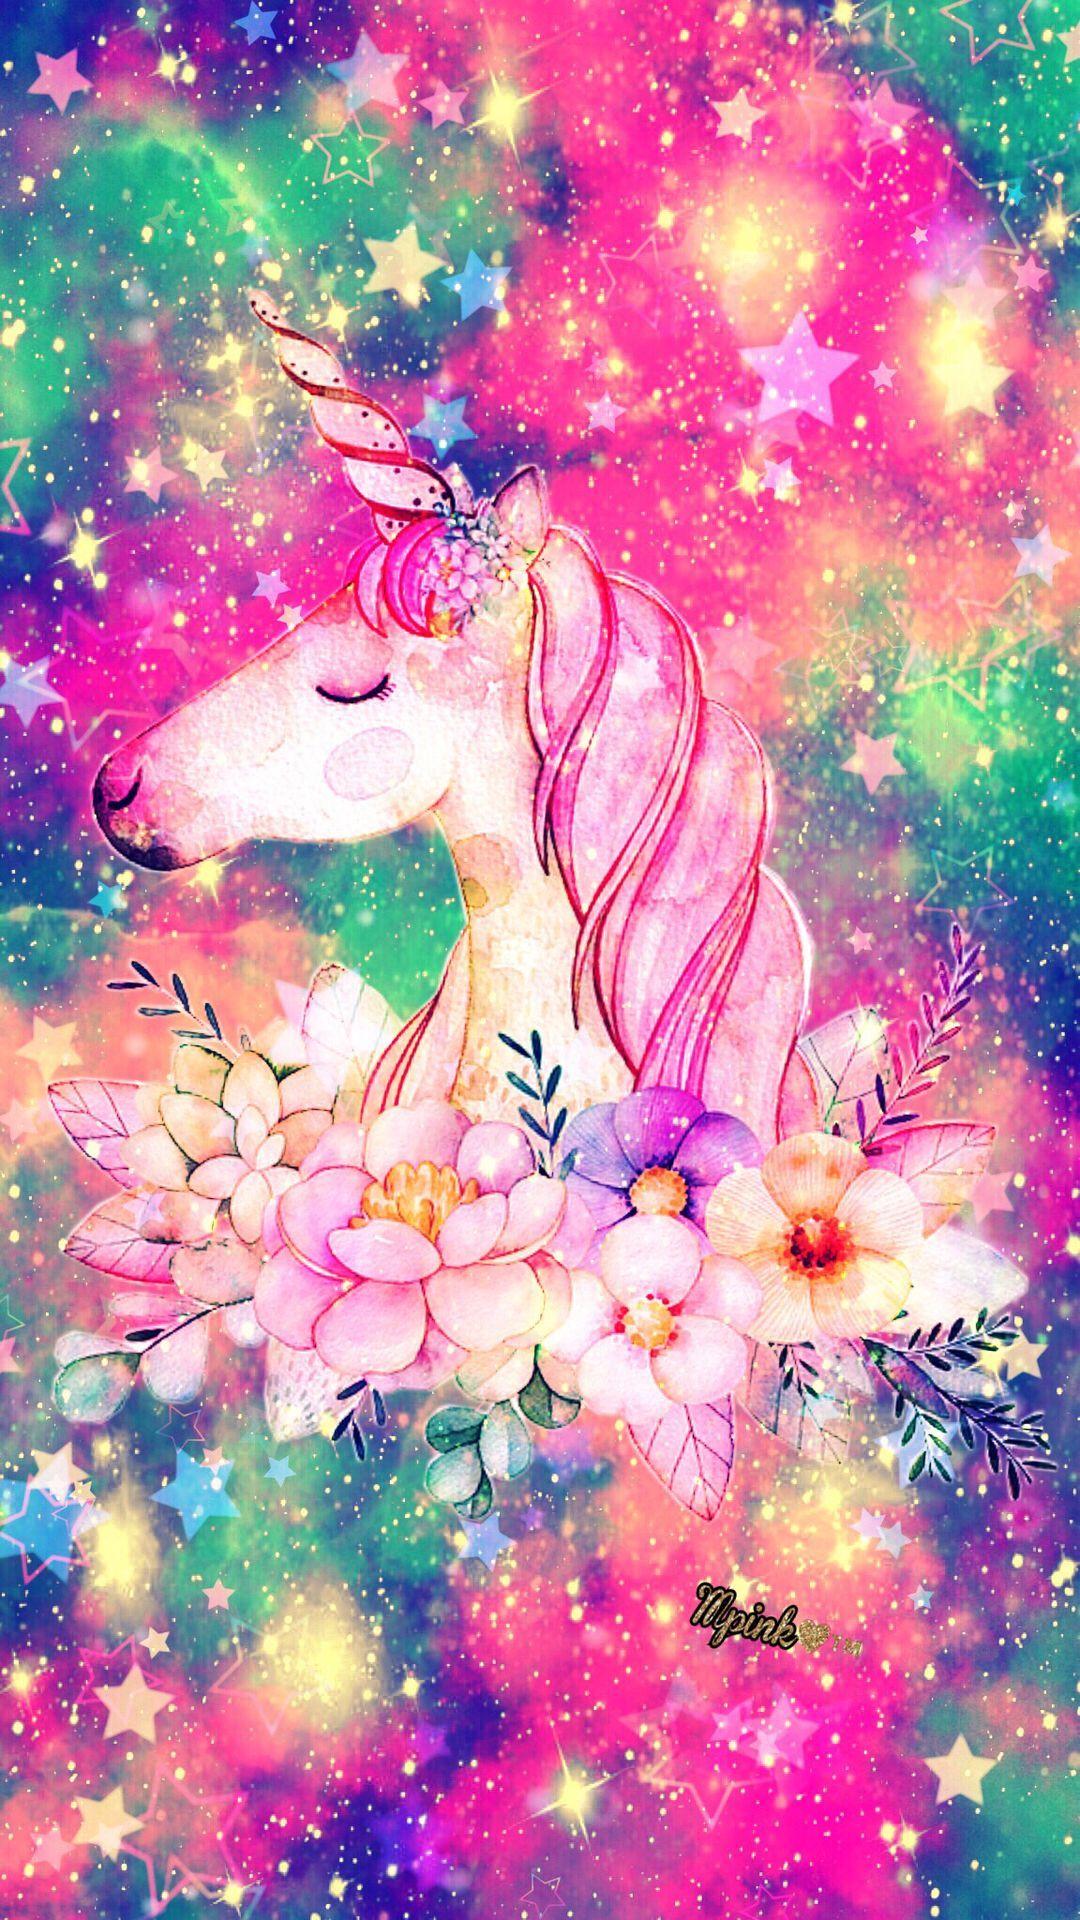 Glitter and Unicorns Wallpapers   Top Glitter and Unicorns 1080x1920